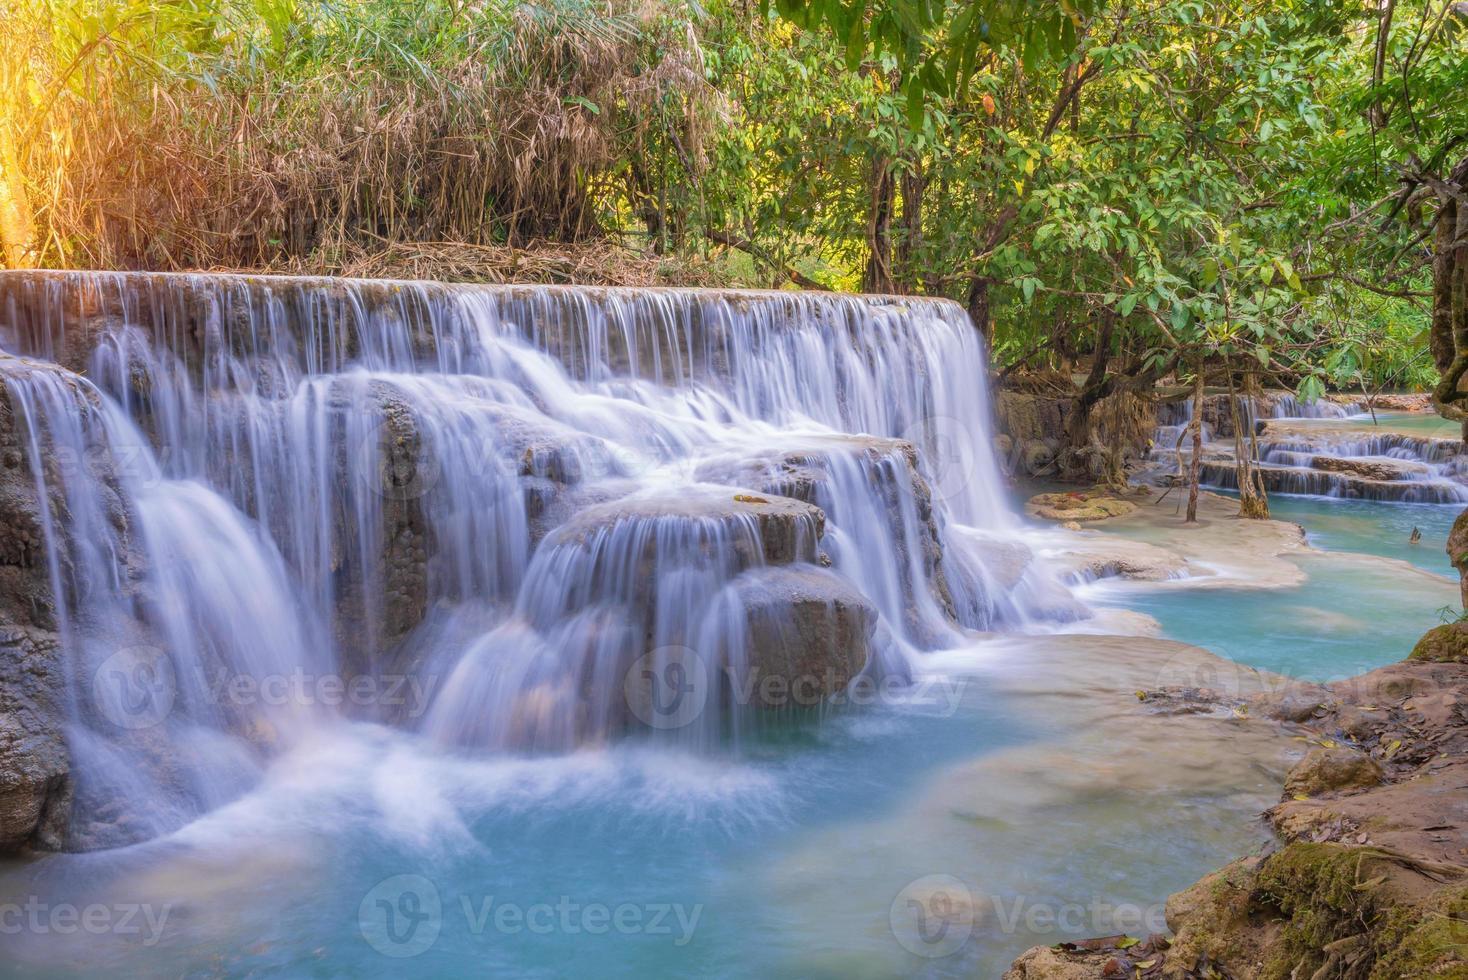 Waterfall in rain forest (Tat Kuang Si Waterfalls at Laos. photo